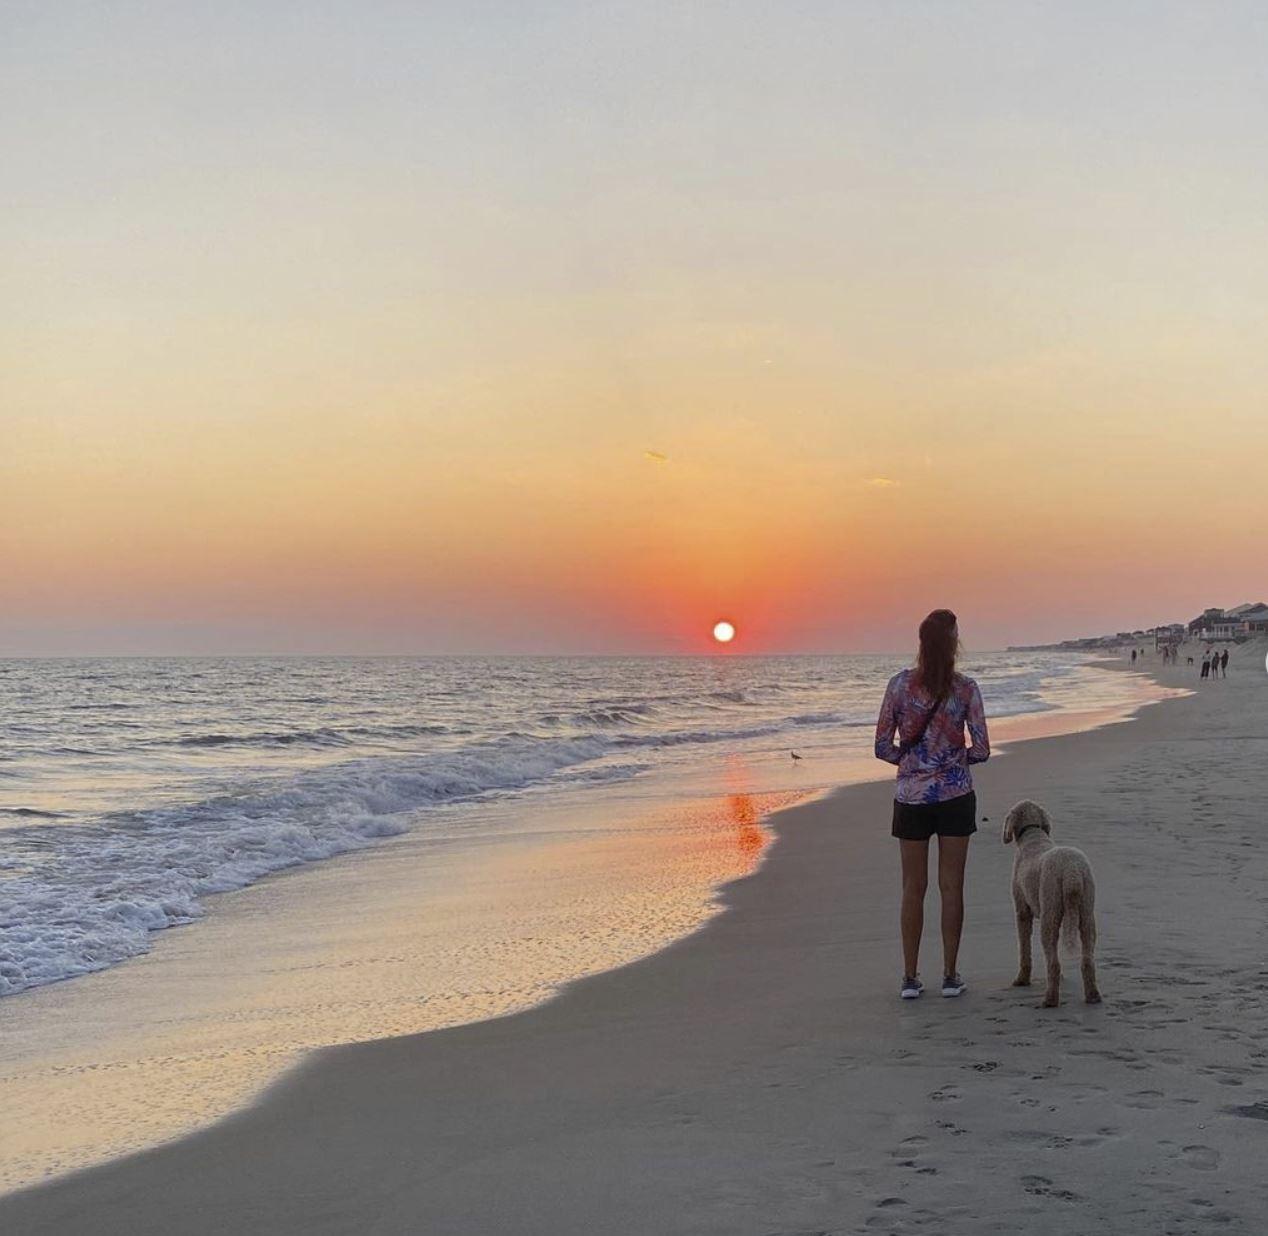 Dog-Friendly Beaches in North Carolina